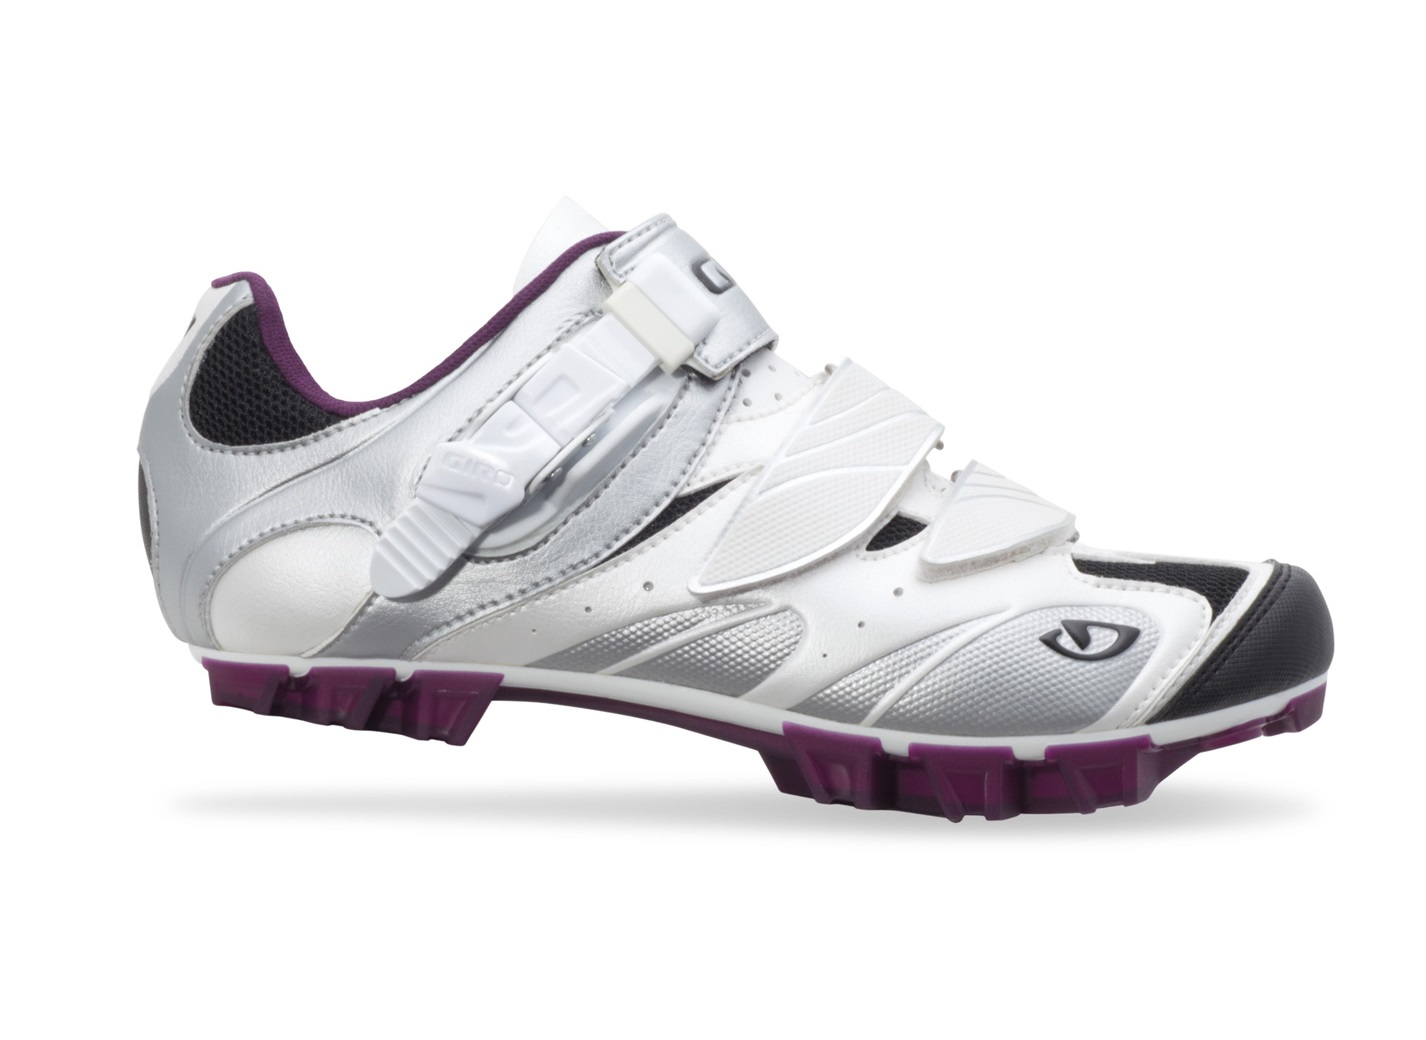 2014 Giro Manta White/ Silver/ Plum SPD Spinning Compatible Women's Mountain Shoe